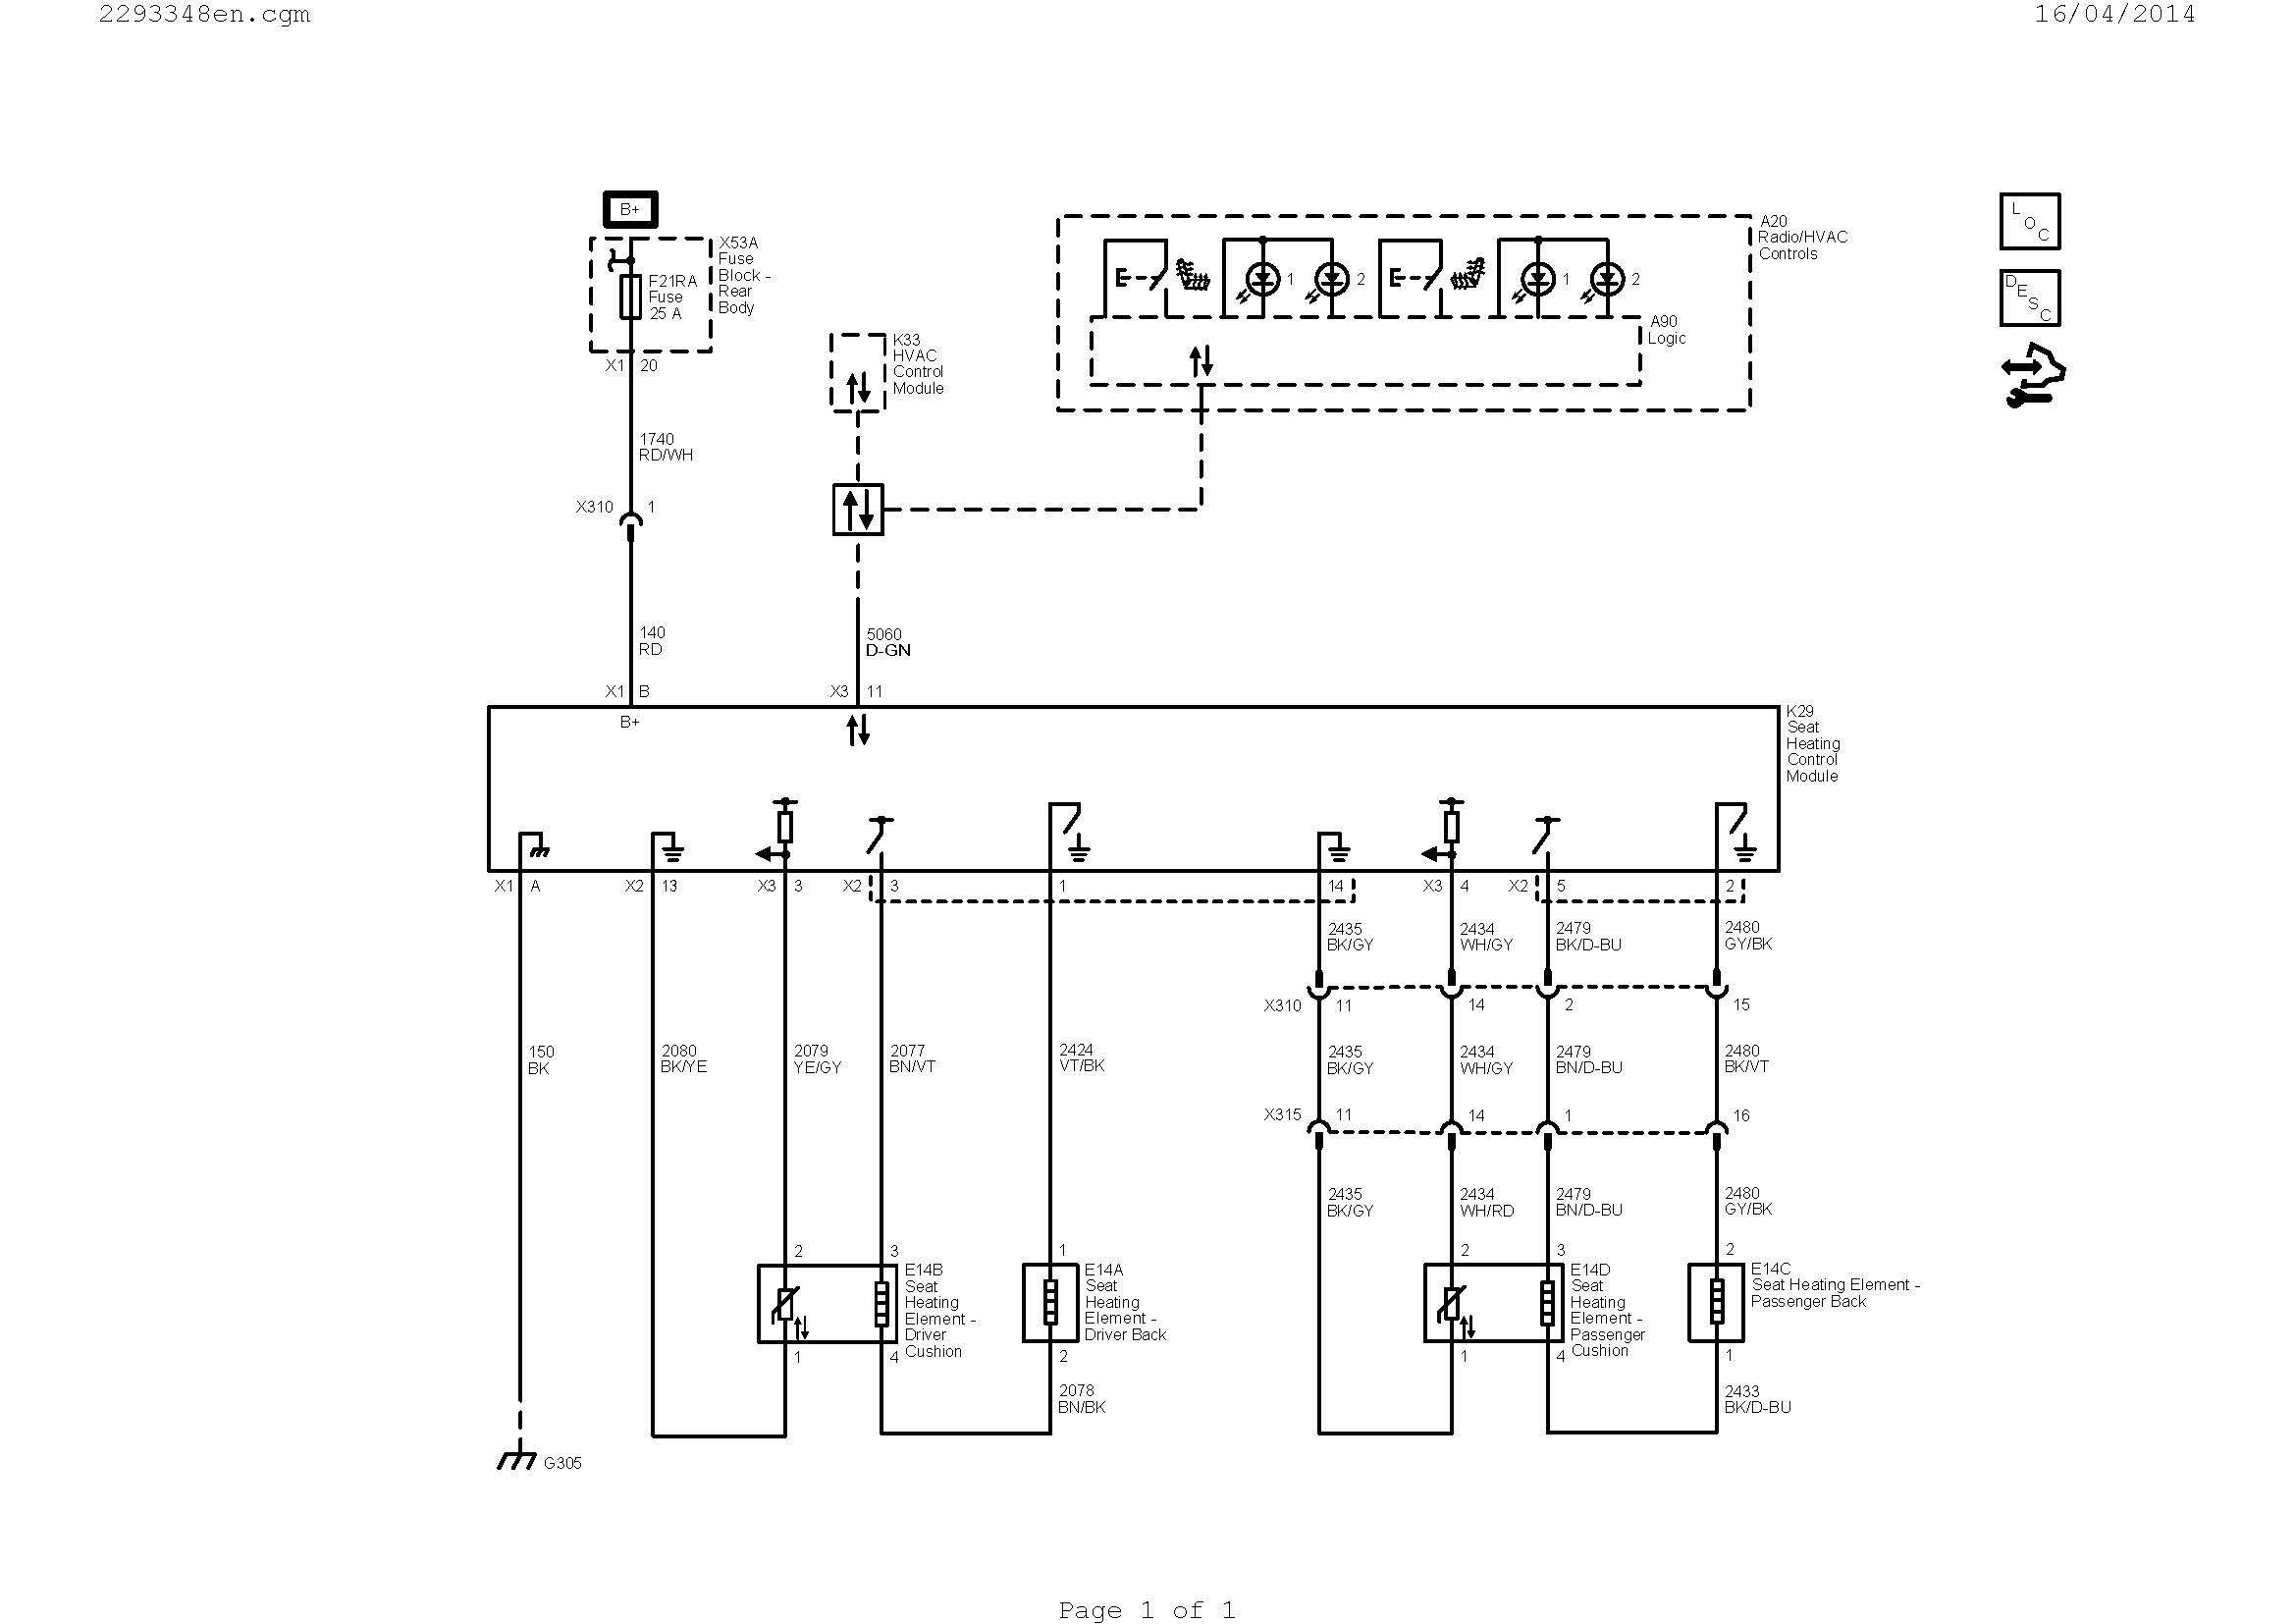 Wiring Diagram or Schematic New Wiring Diagram Guitar Fresh Hvac Diagram Best Hvac Diagram 0d